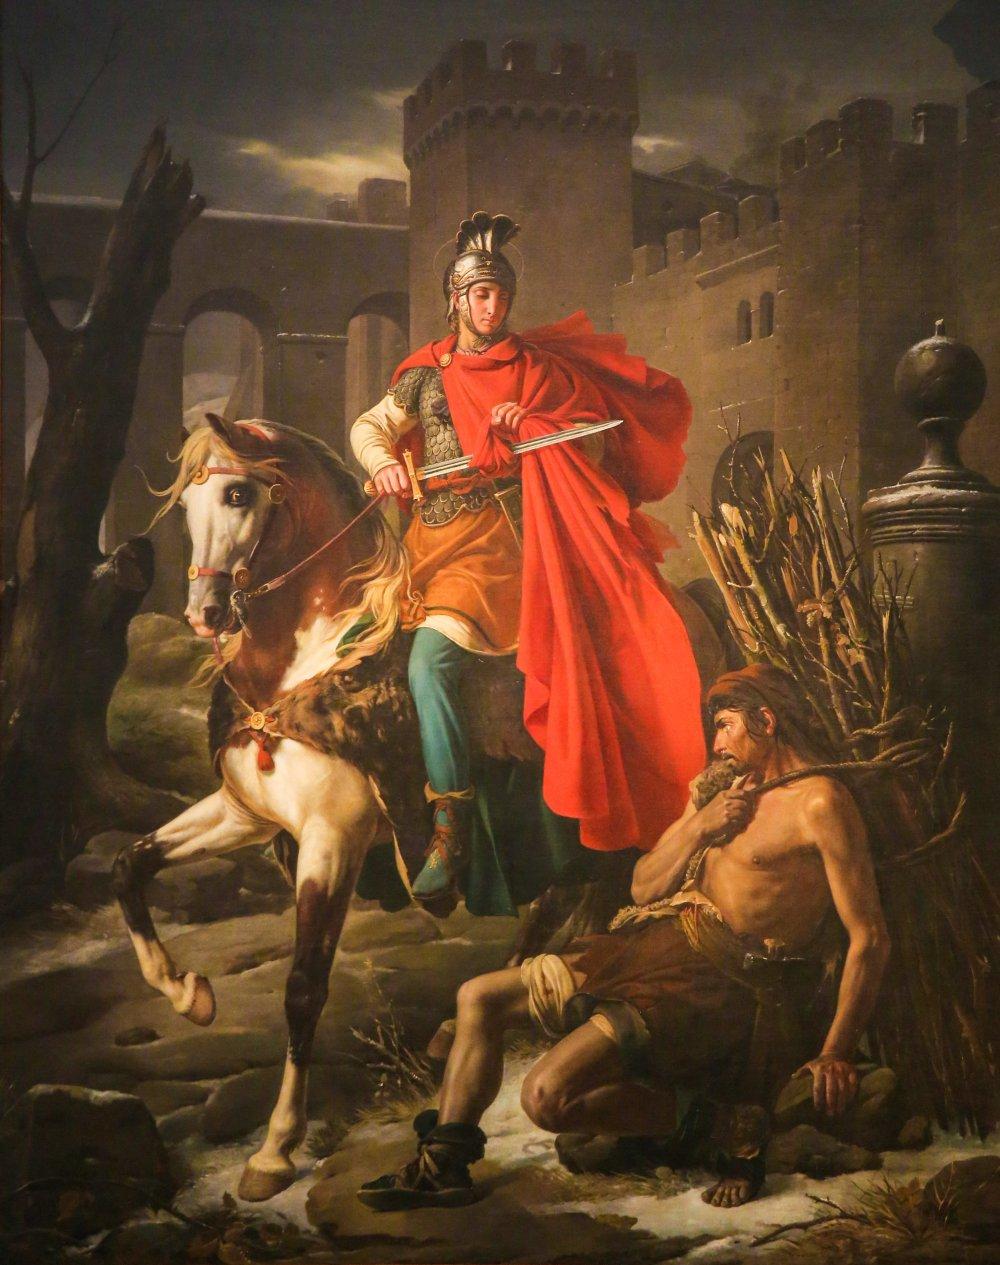 H. Martinus van Tours